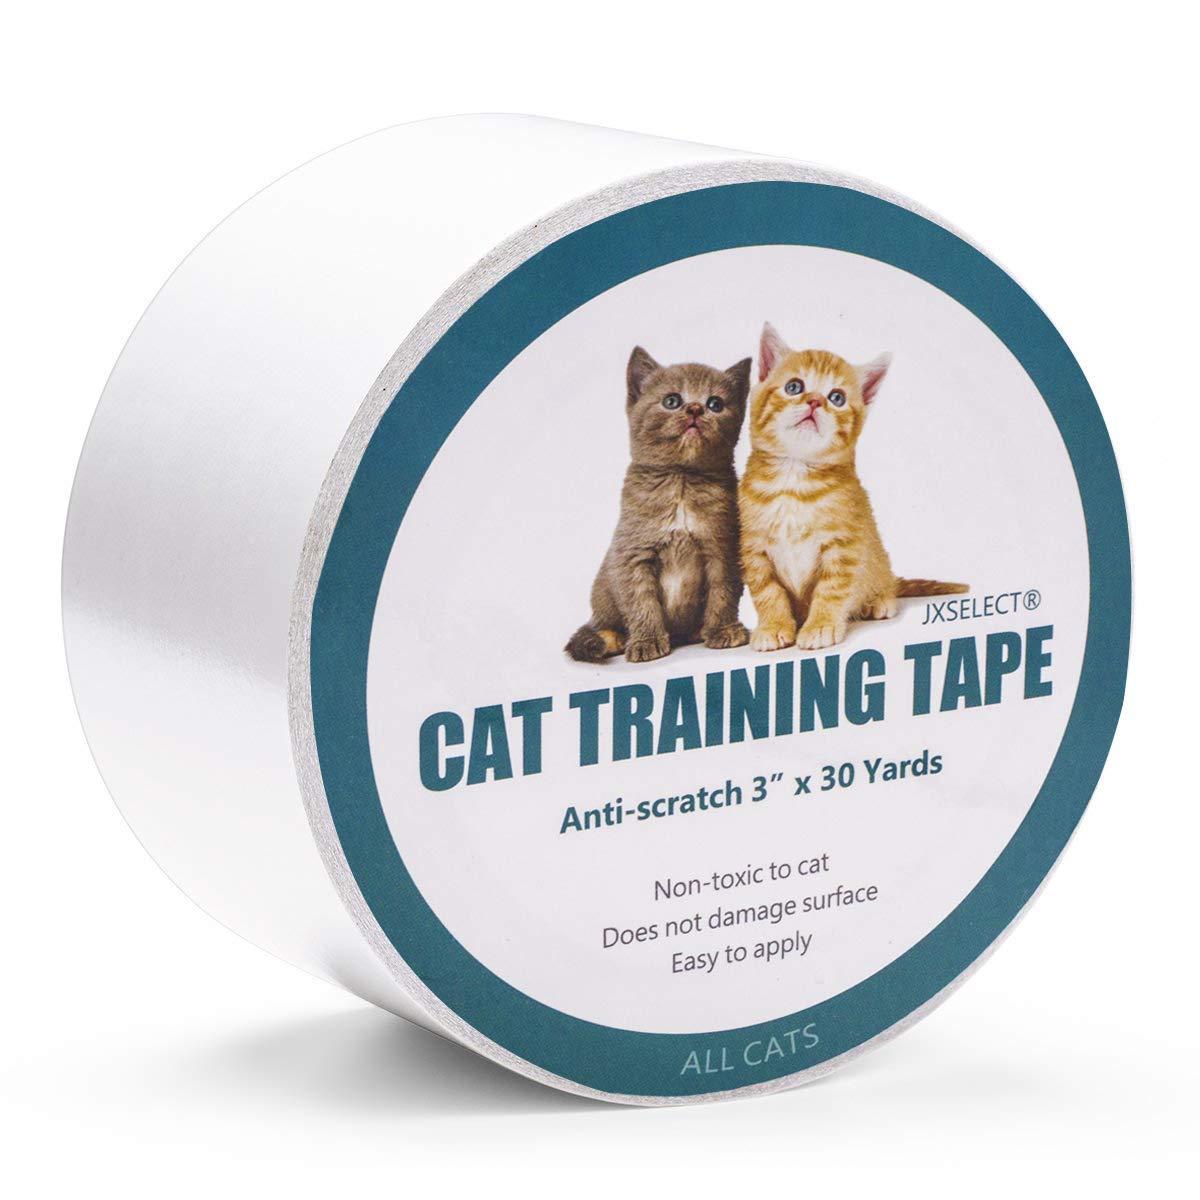 Jxselect 家具 ソファドアカーペットペットスクラッチプロテクタ3インチ×30ヤード 用 アンチスクラッチ猫 トレーニングテープ猫スクラッチ防止テープ. 3